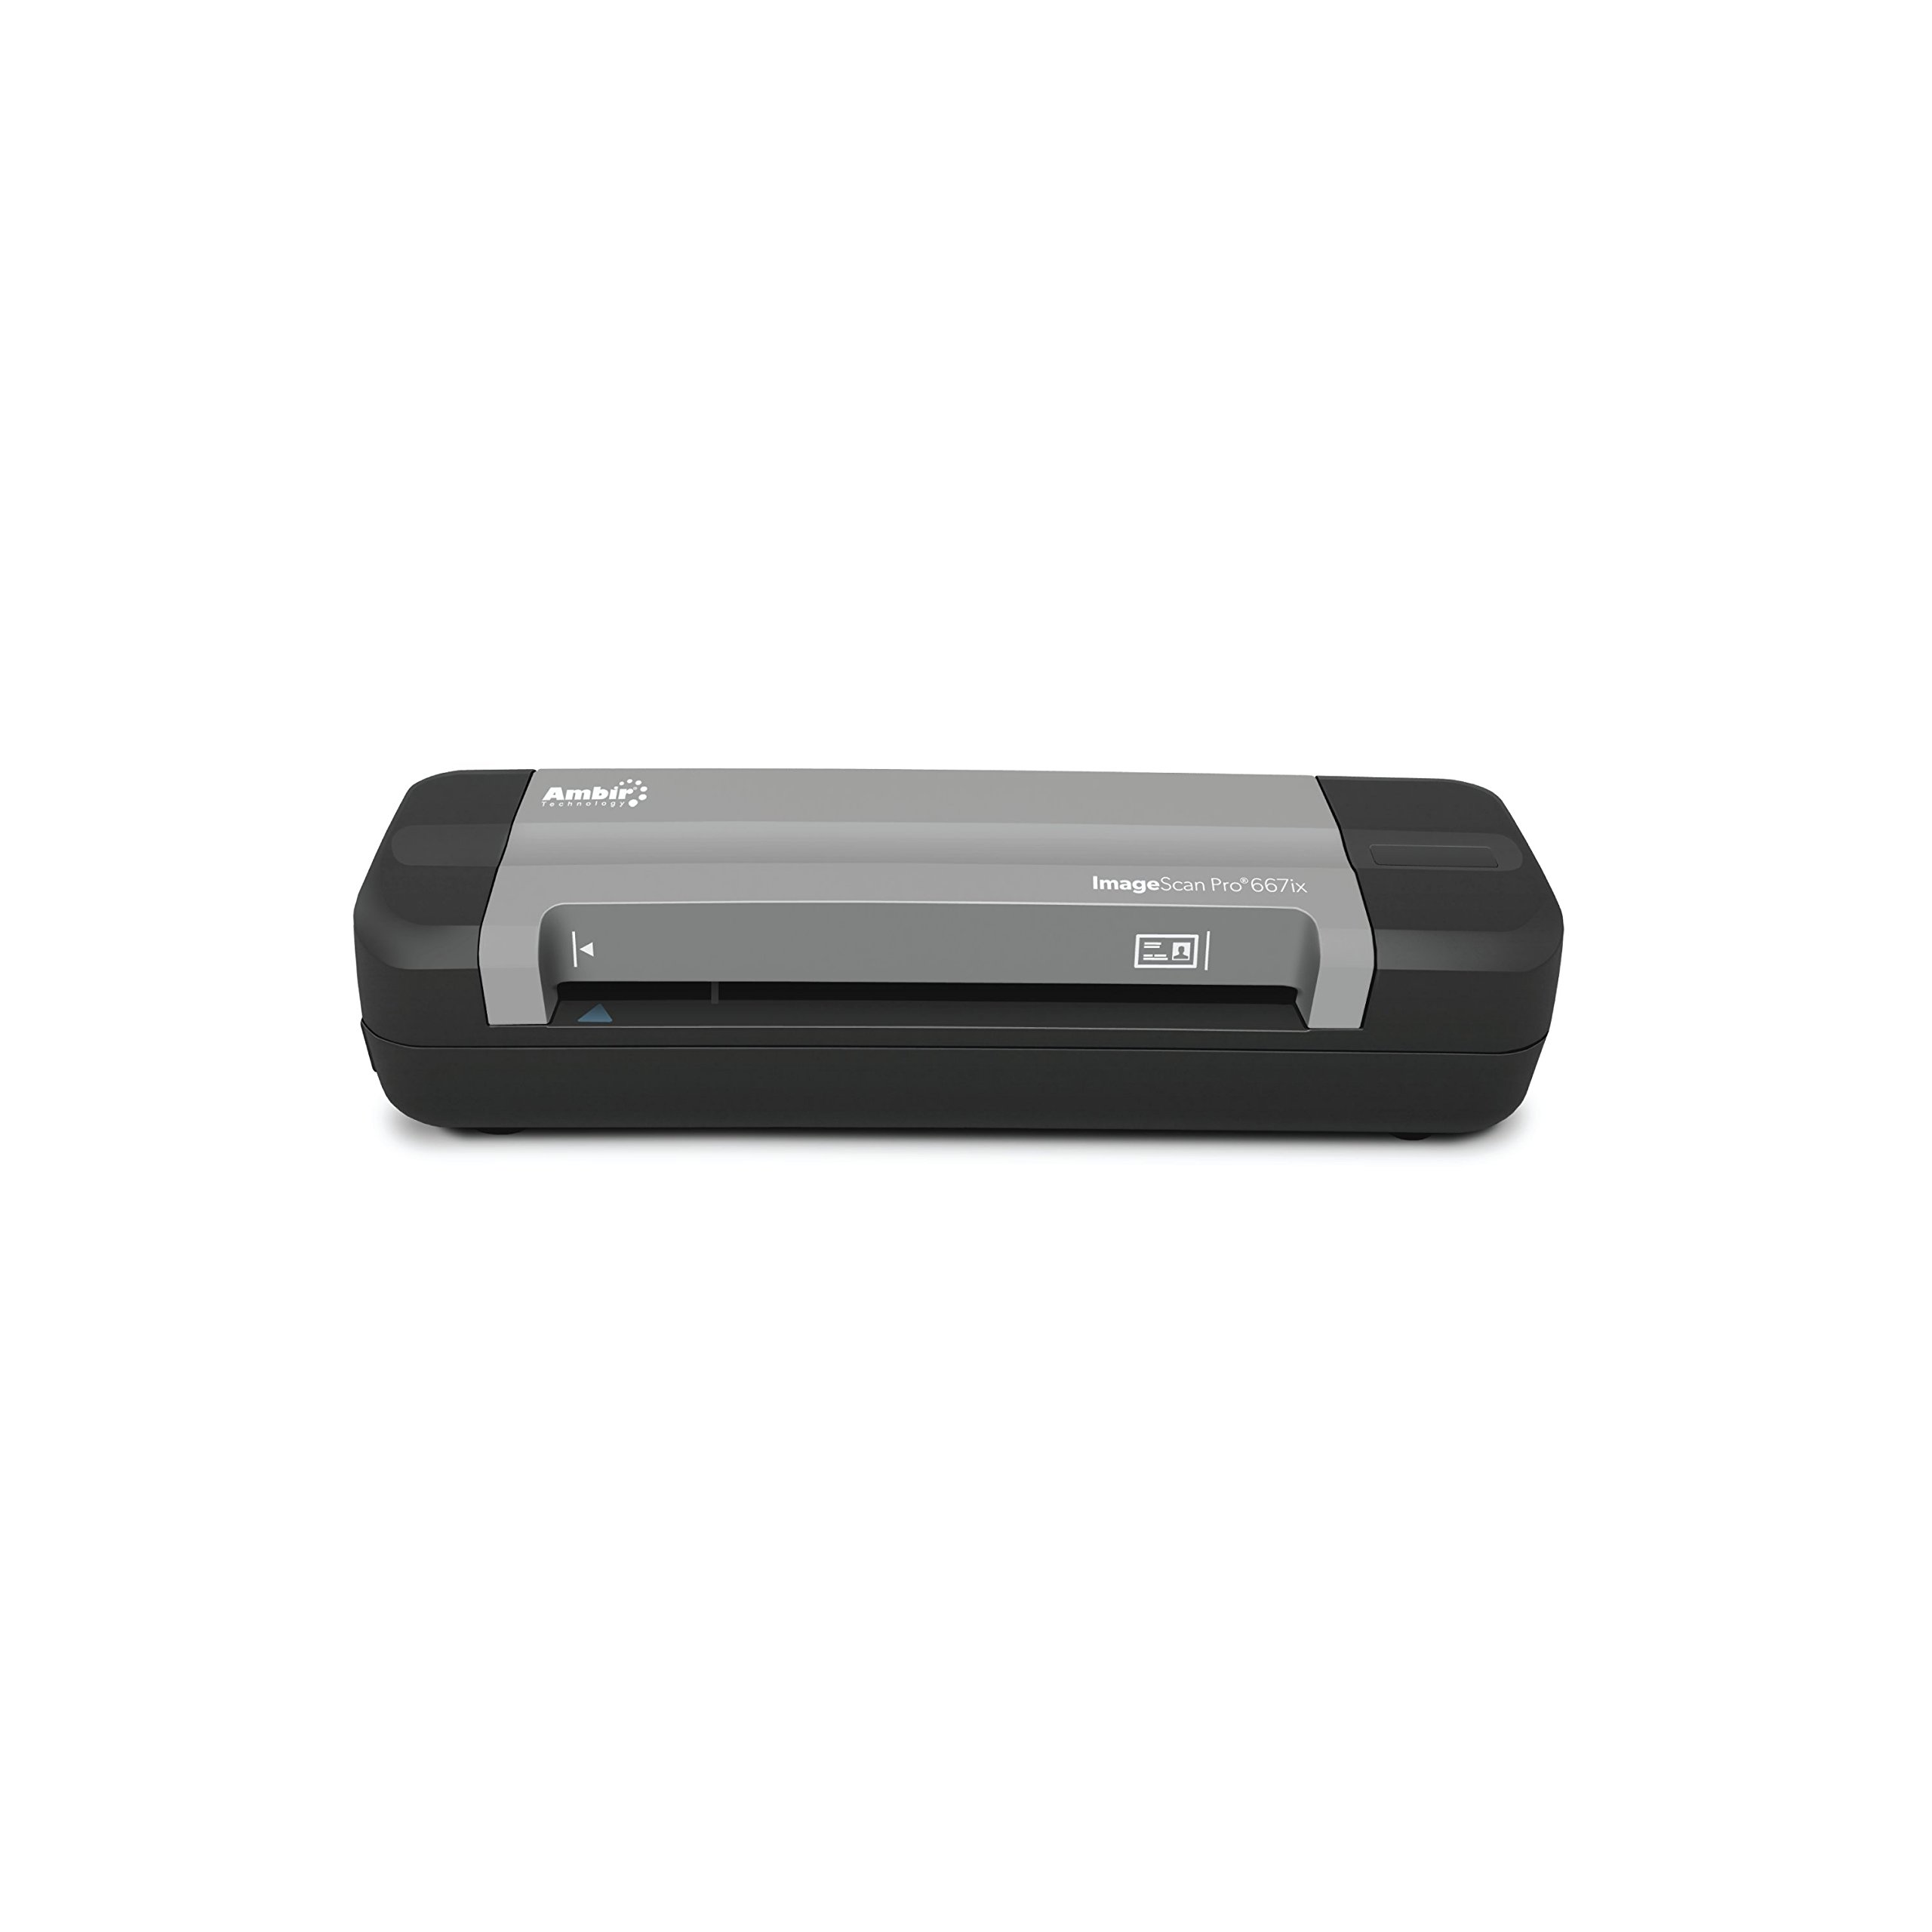 Ambir Simplex ID Card Scanner (PS667ix-AS) Simplex ID Card Scanner with AmbirScan